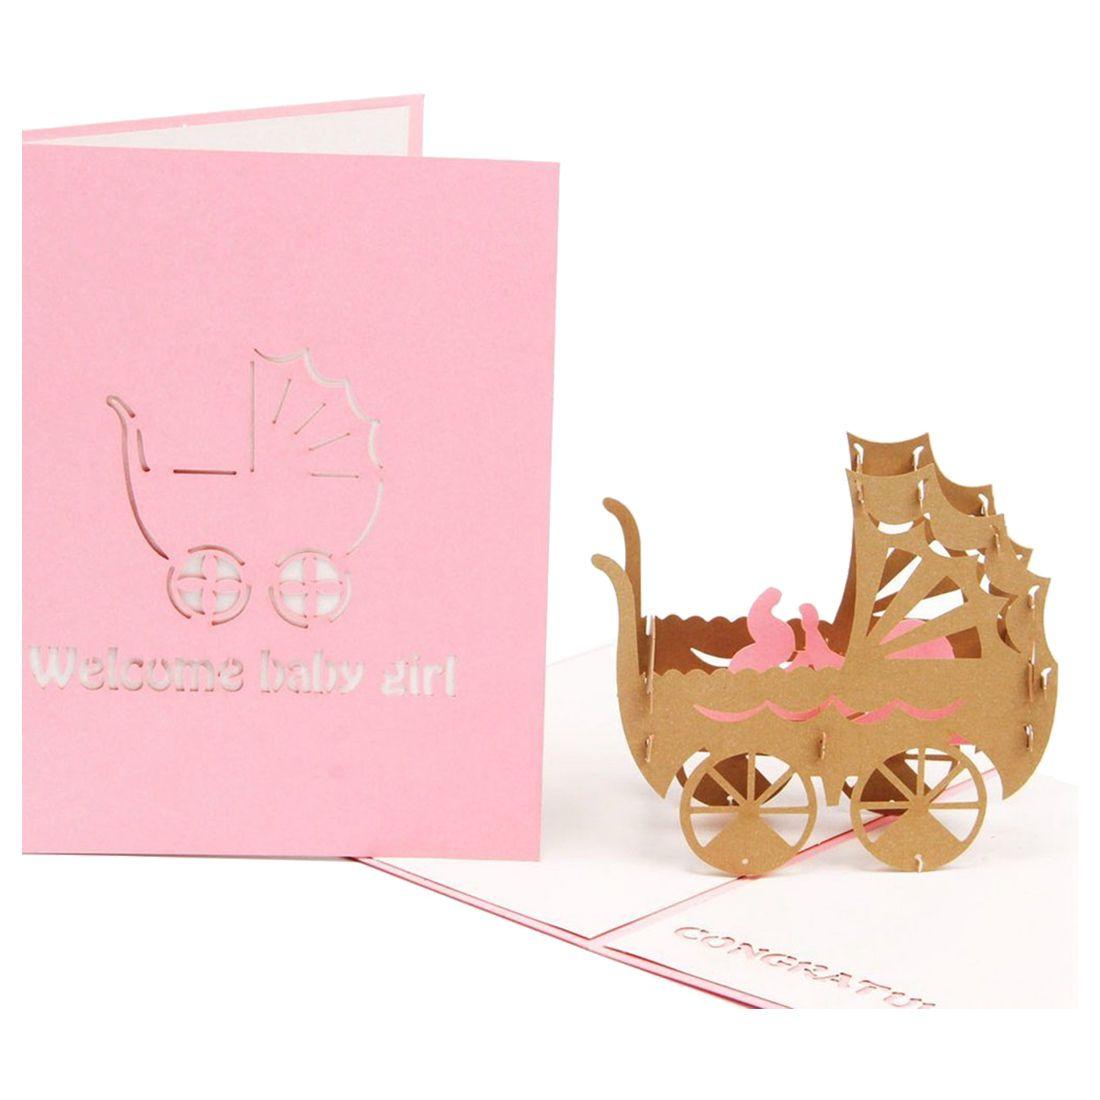 Perfect-3D Baby in pram Card Pop up Birthday Card Baby Gift Handmade Kirigami Paper Art Blank 3D Greeting Card(Baby Girl)